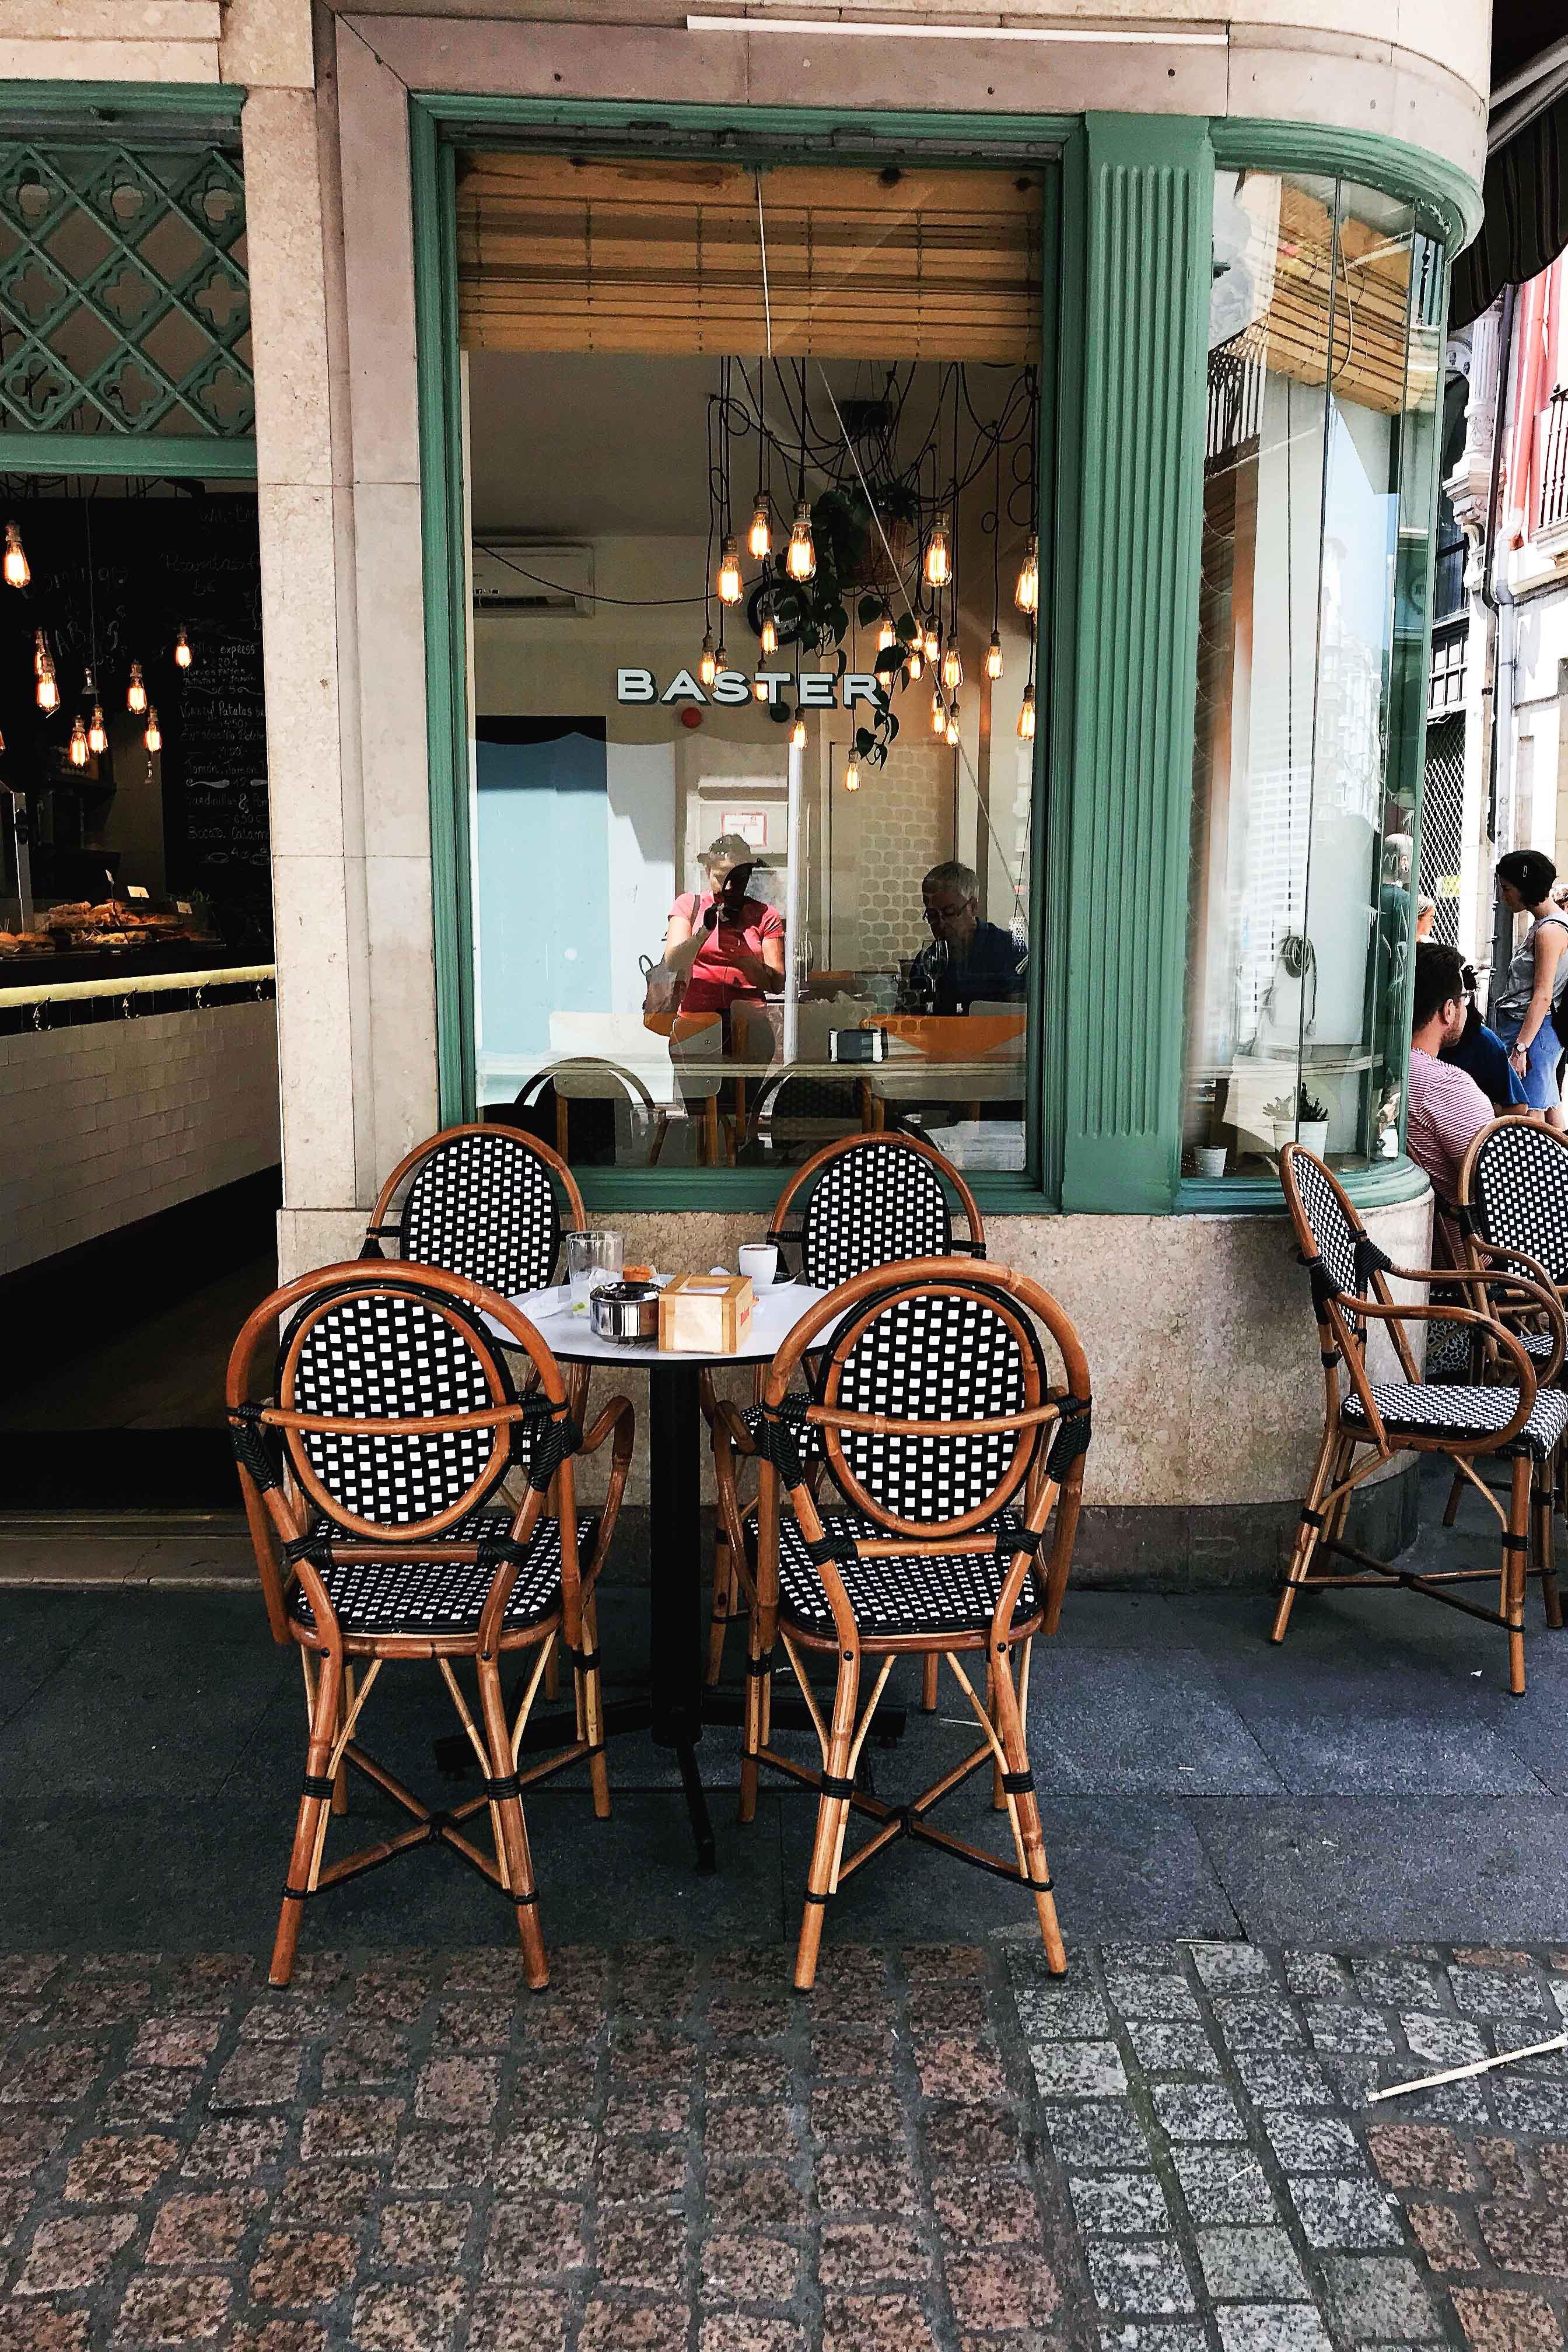 Baster Bar   A Guide to The Best Pintxos Bars in Bilbao   Mondomulia